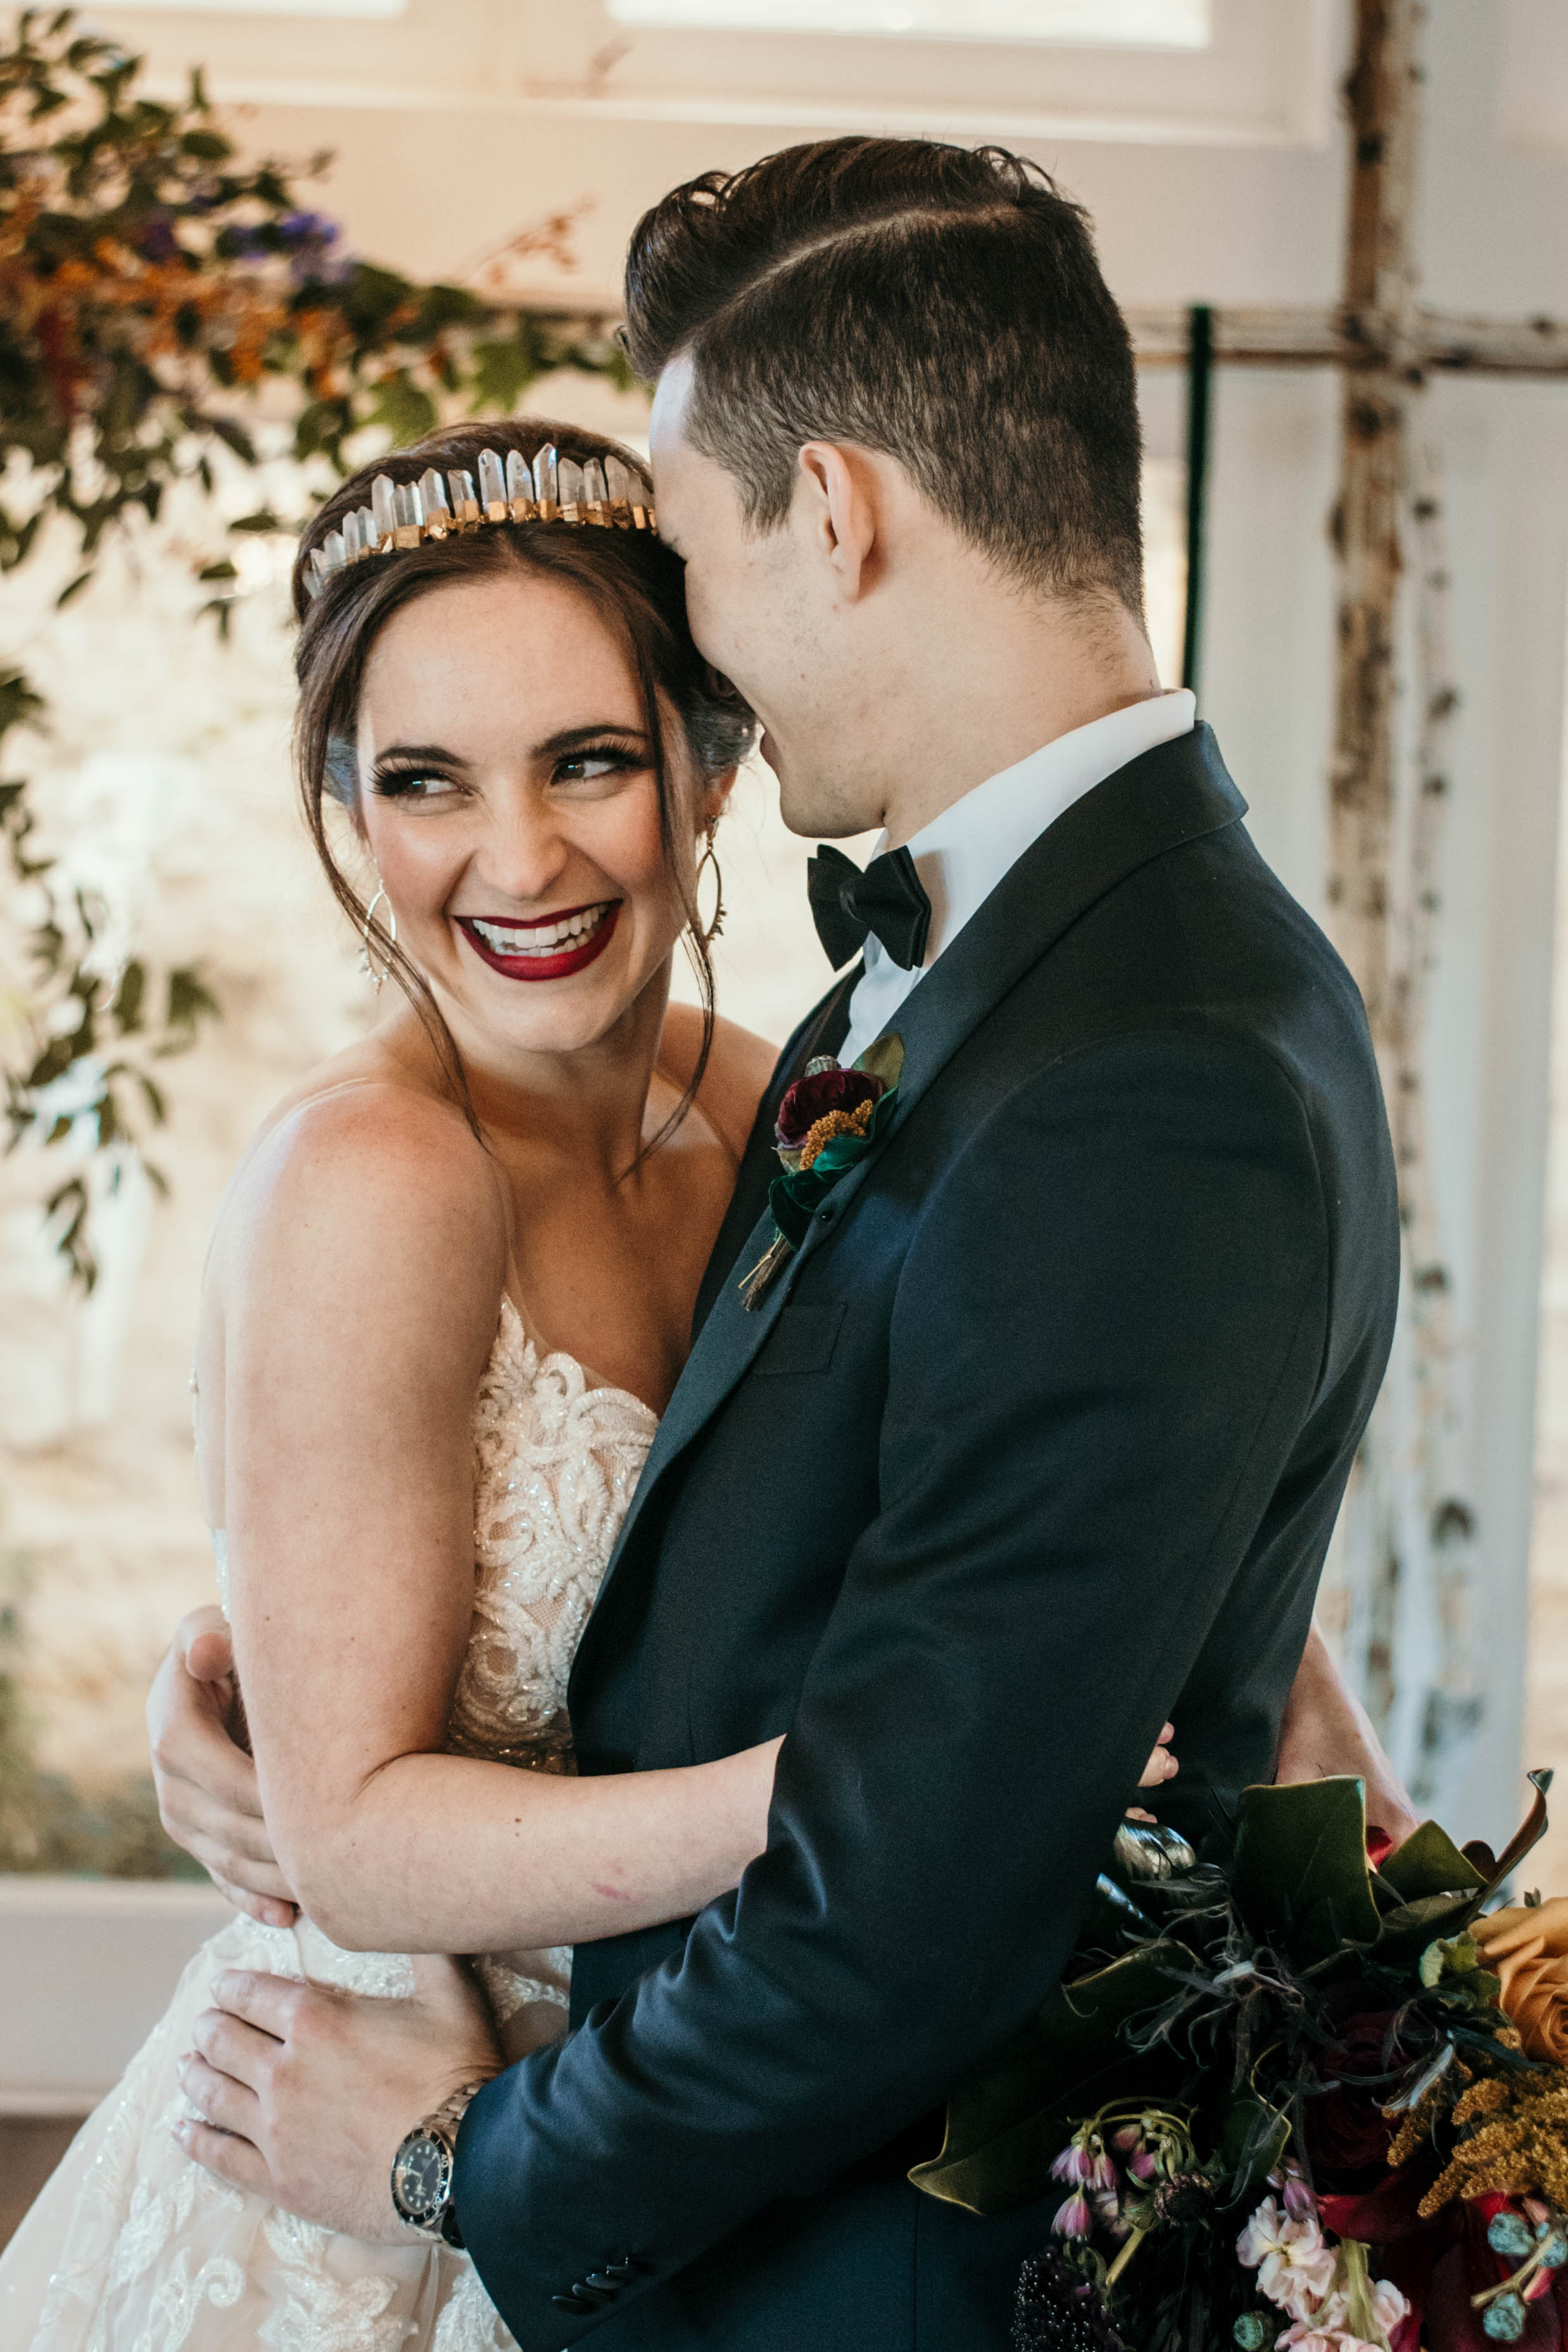 Austin Wedding Videographer - Dolls for Dolls (273 of 323).jpg